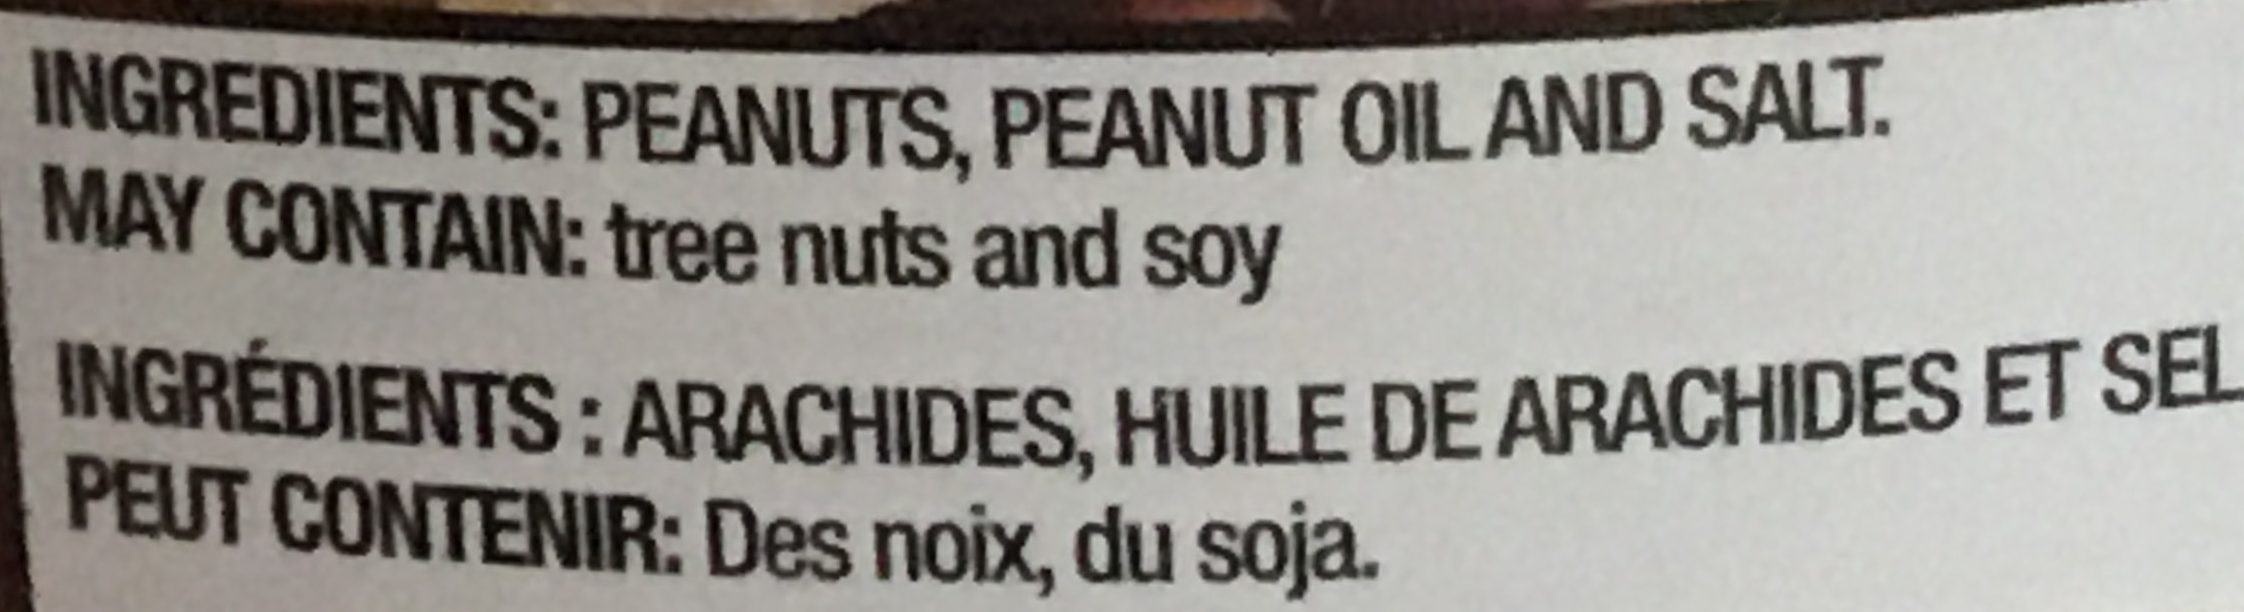 Arachides - Ingredients - fr